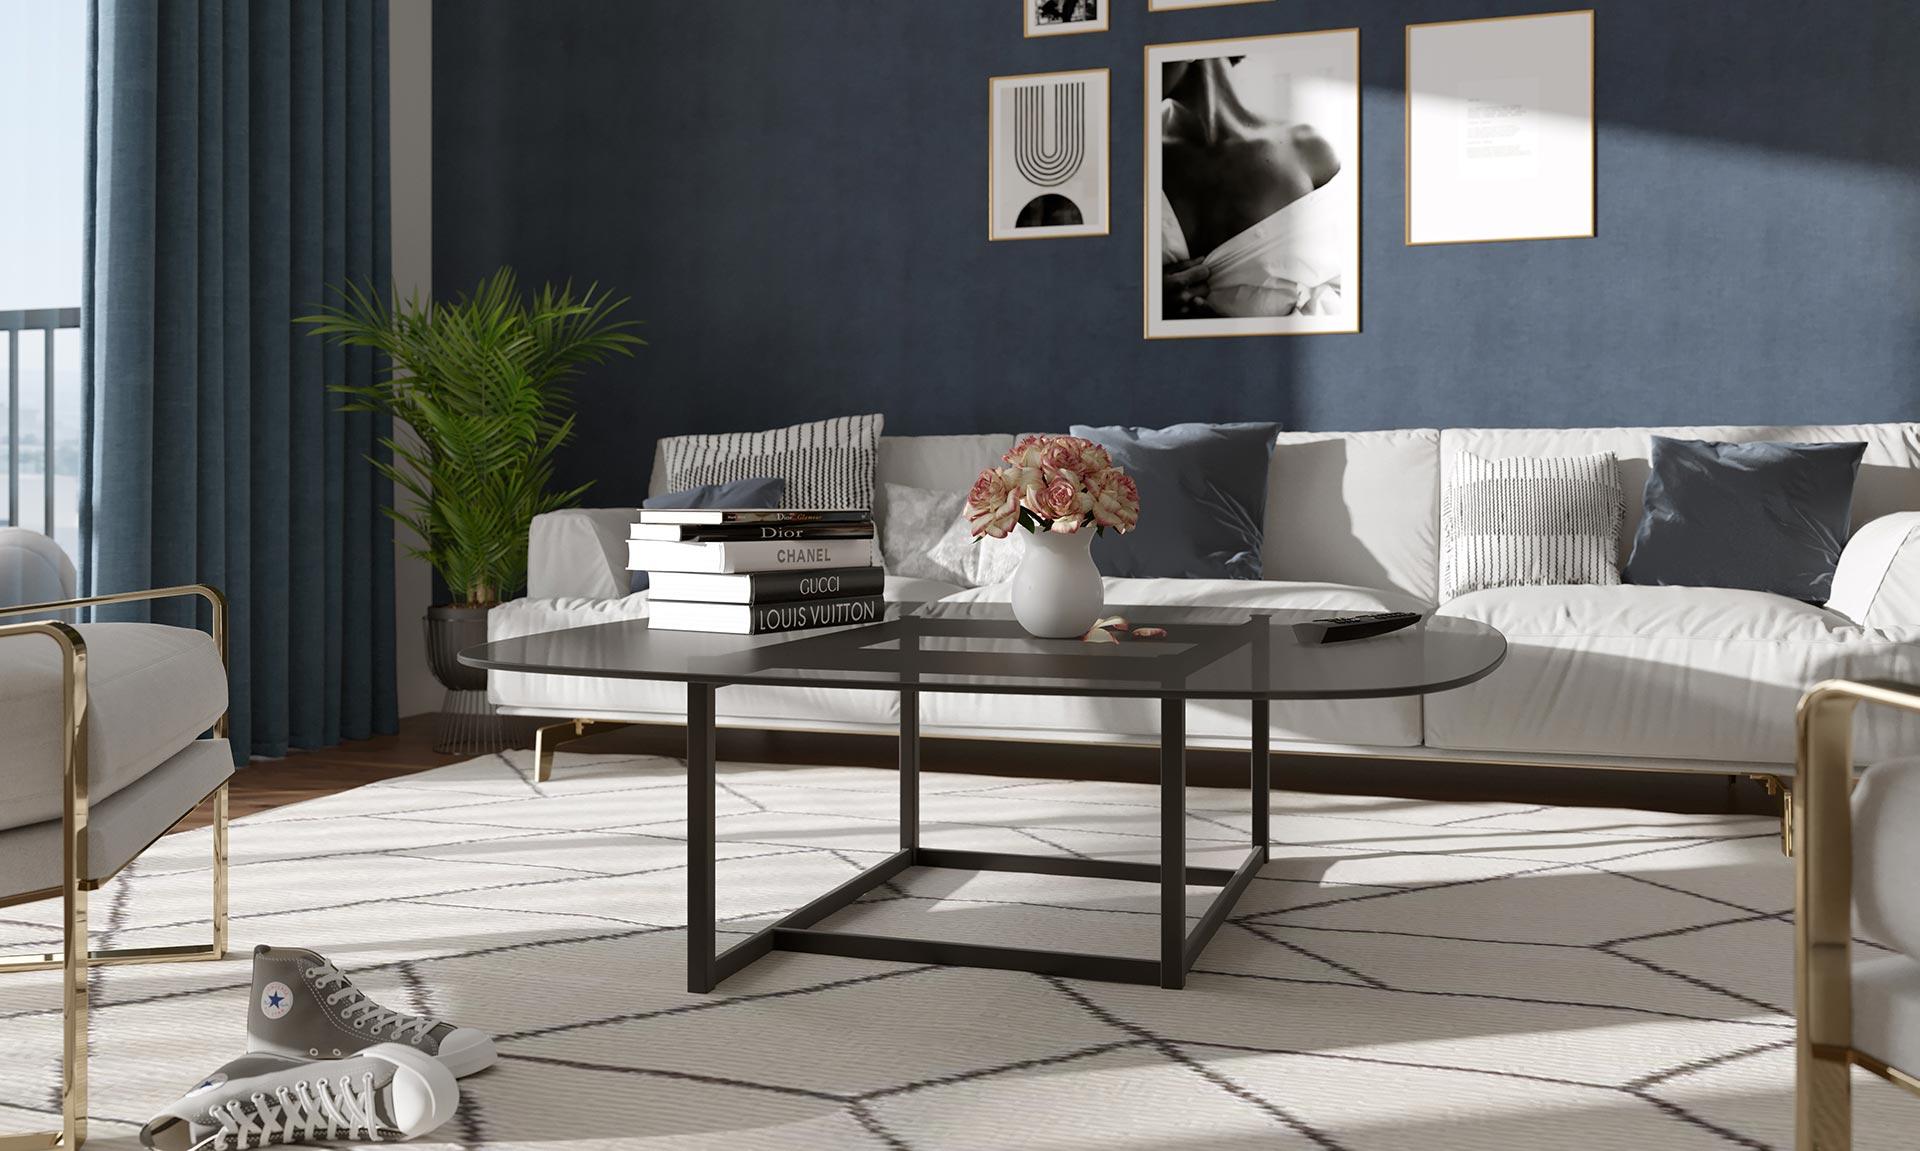 Furniture Lifestyle Visualisation